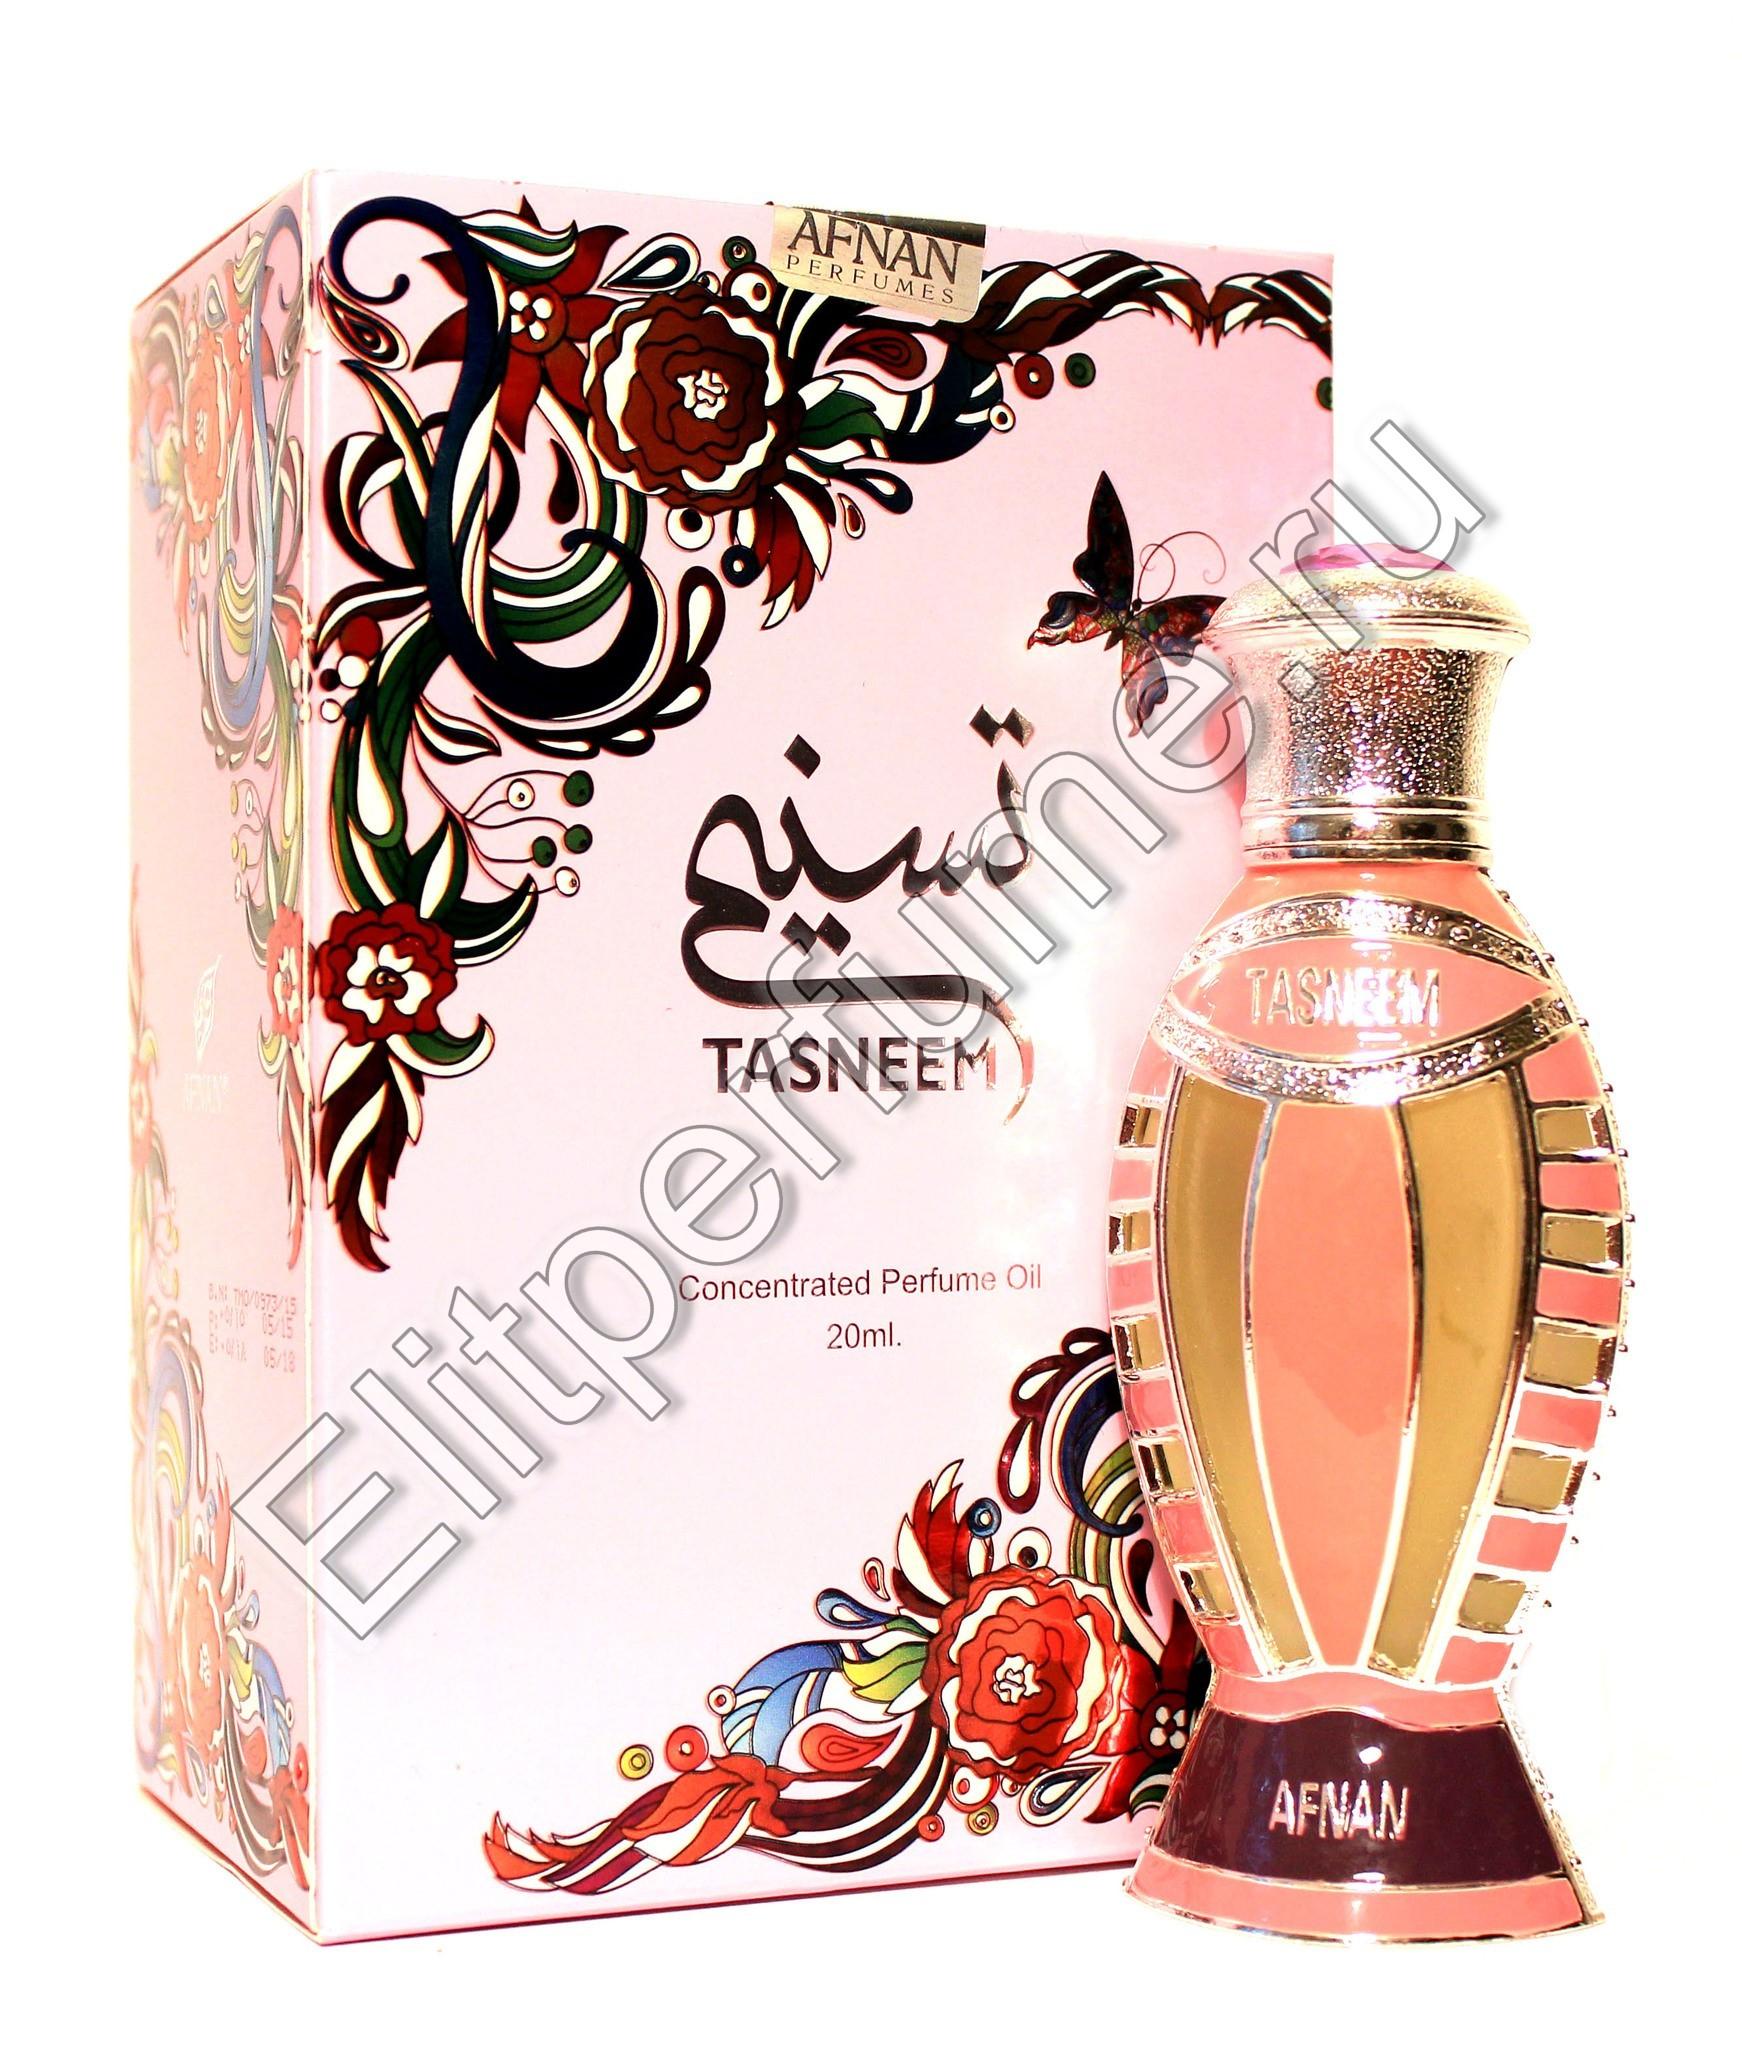 Tasneem Тасним 20 мл арабские масляные духи от Афнан Парфюм Afnan Perfumes